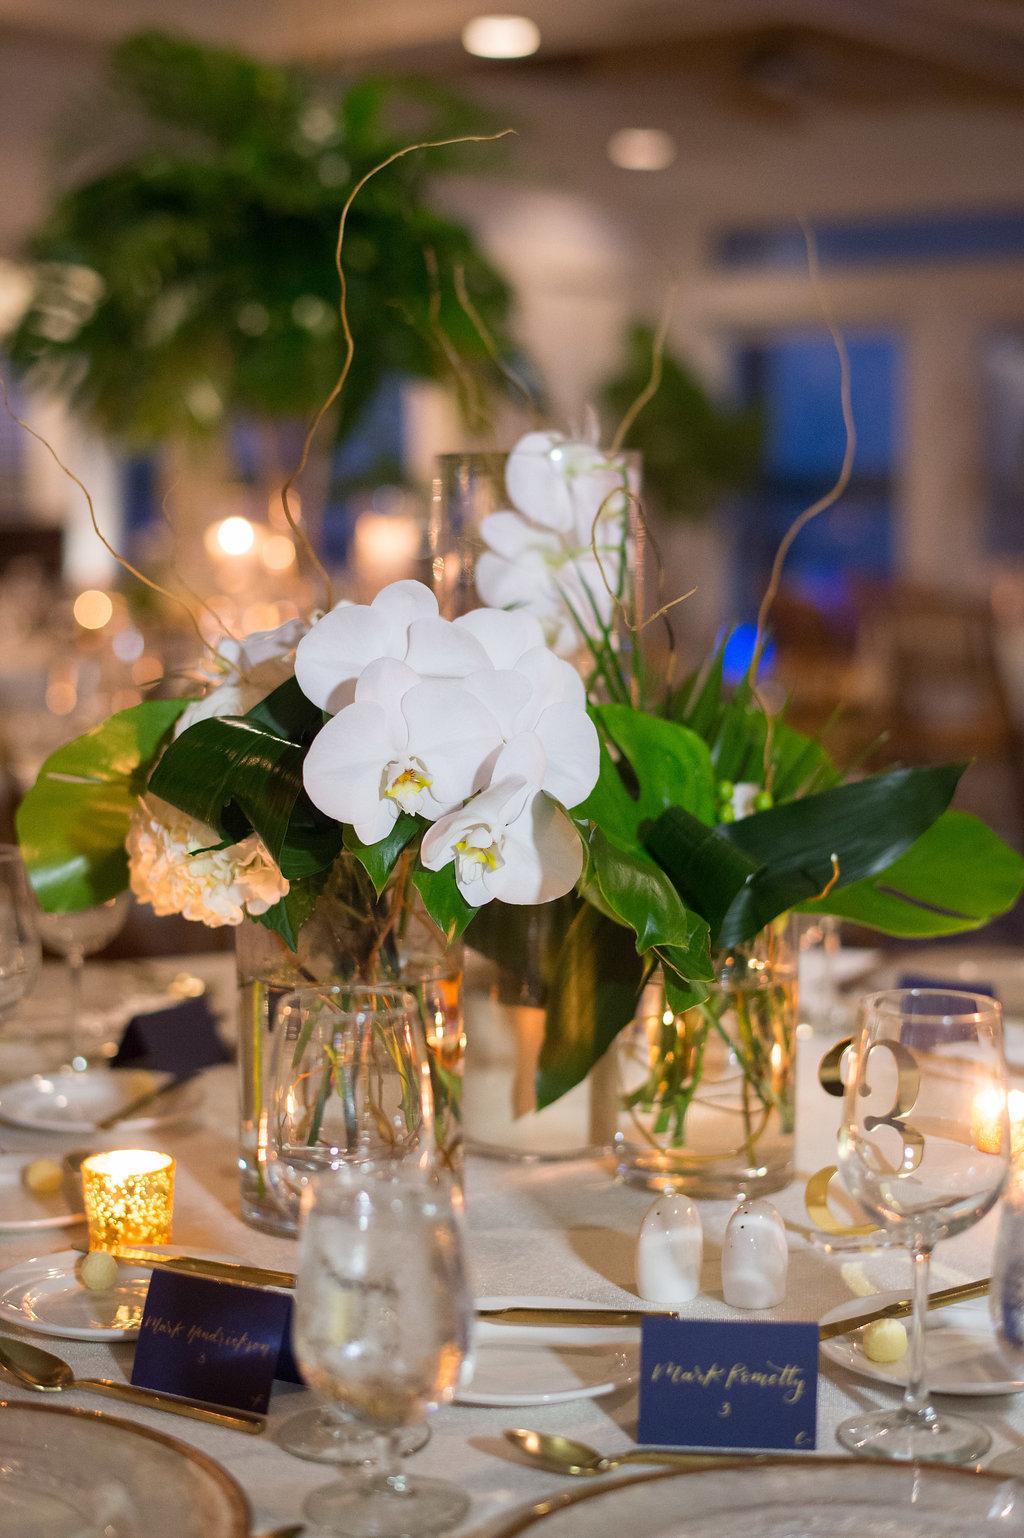 Indoor Wedding Reception Decor Low Centerpiece With White